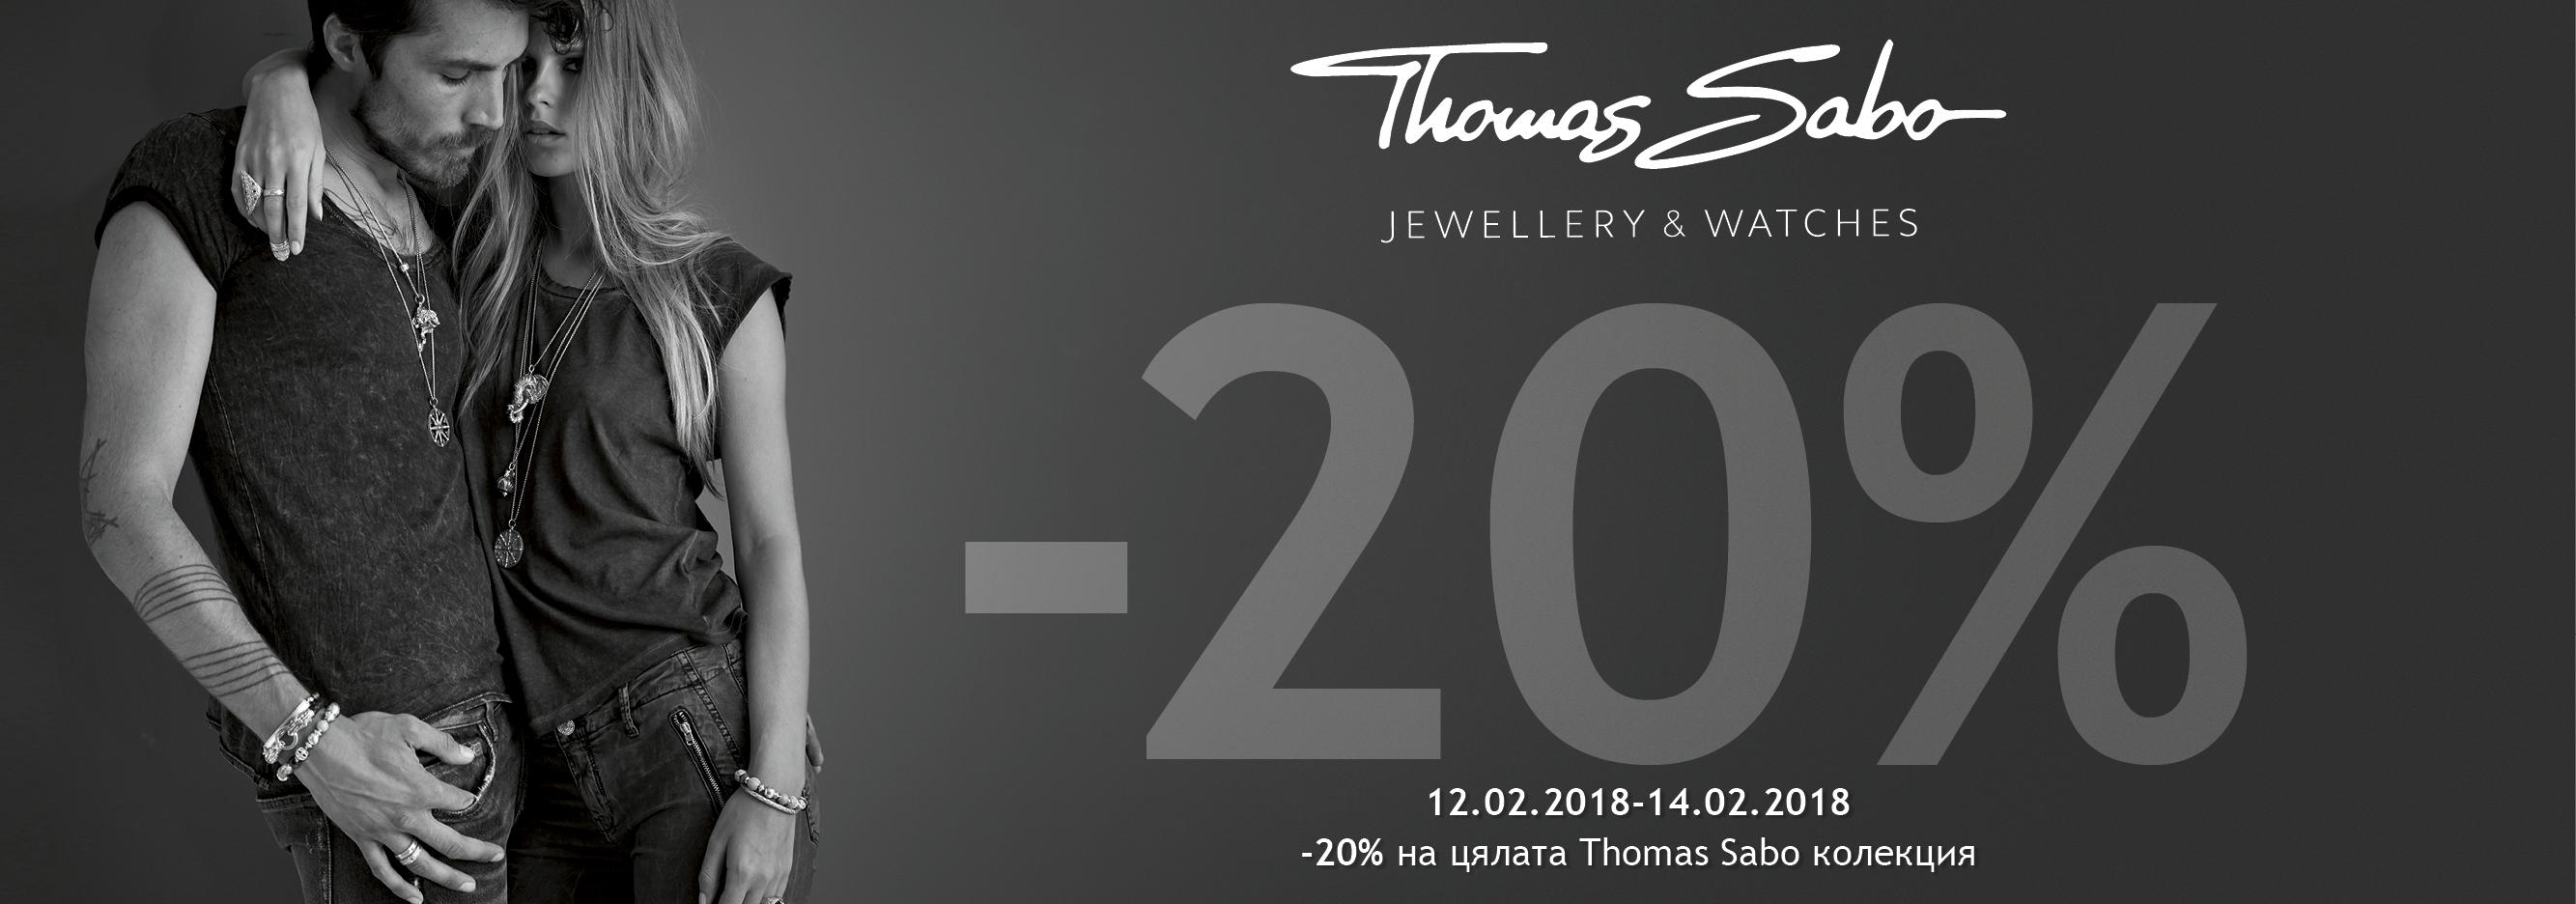 THOMAS SABO 20% намаление от 12 до 14.02.2018